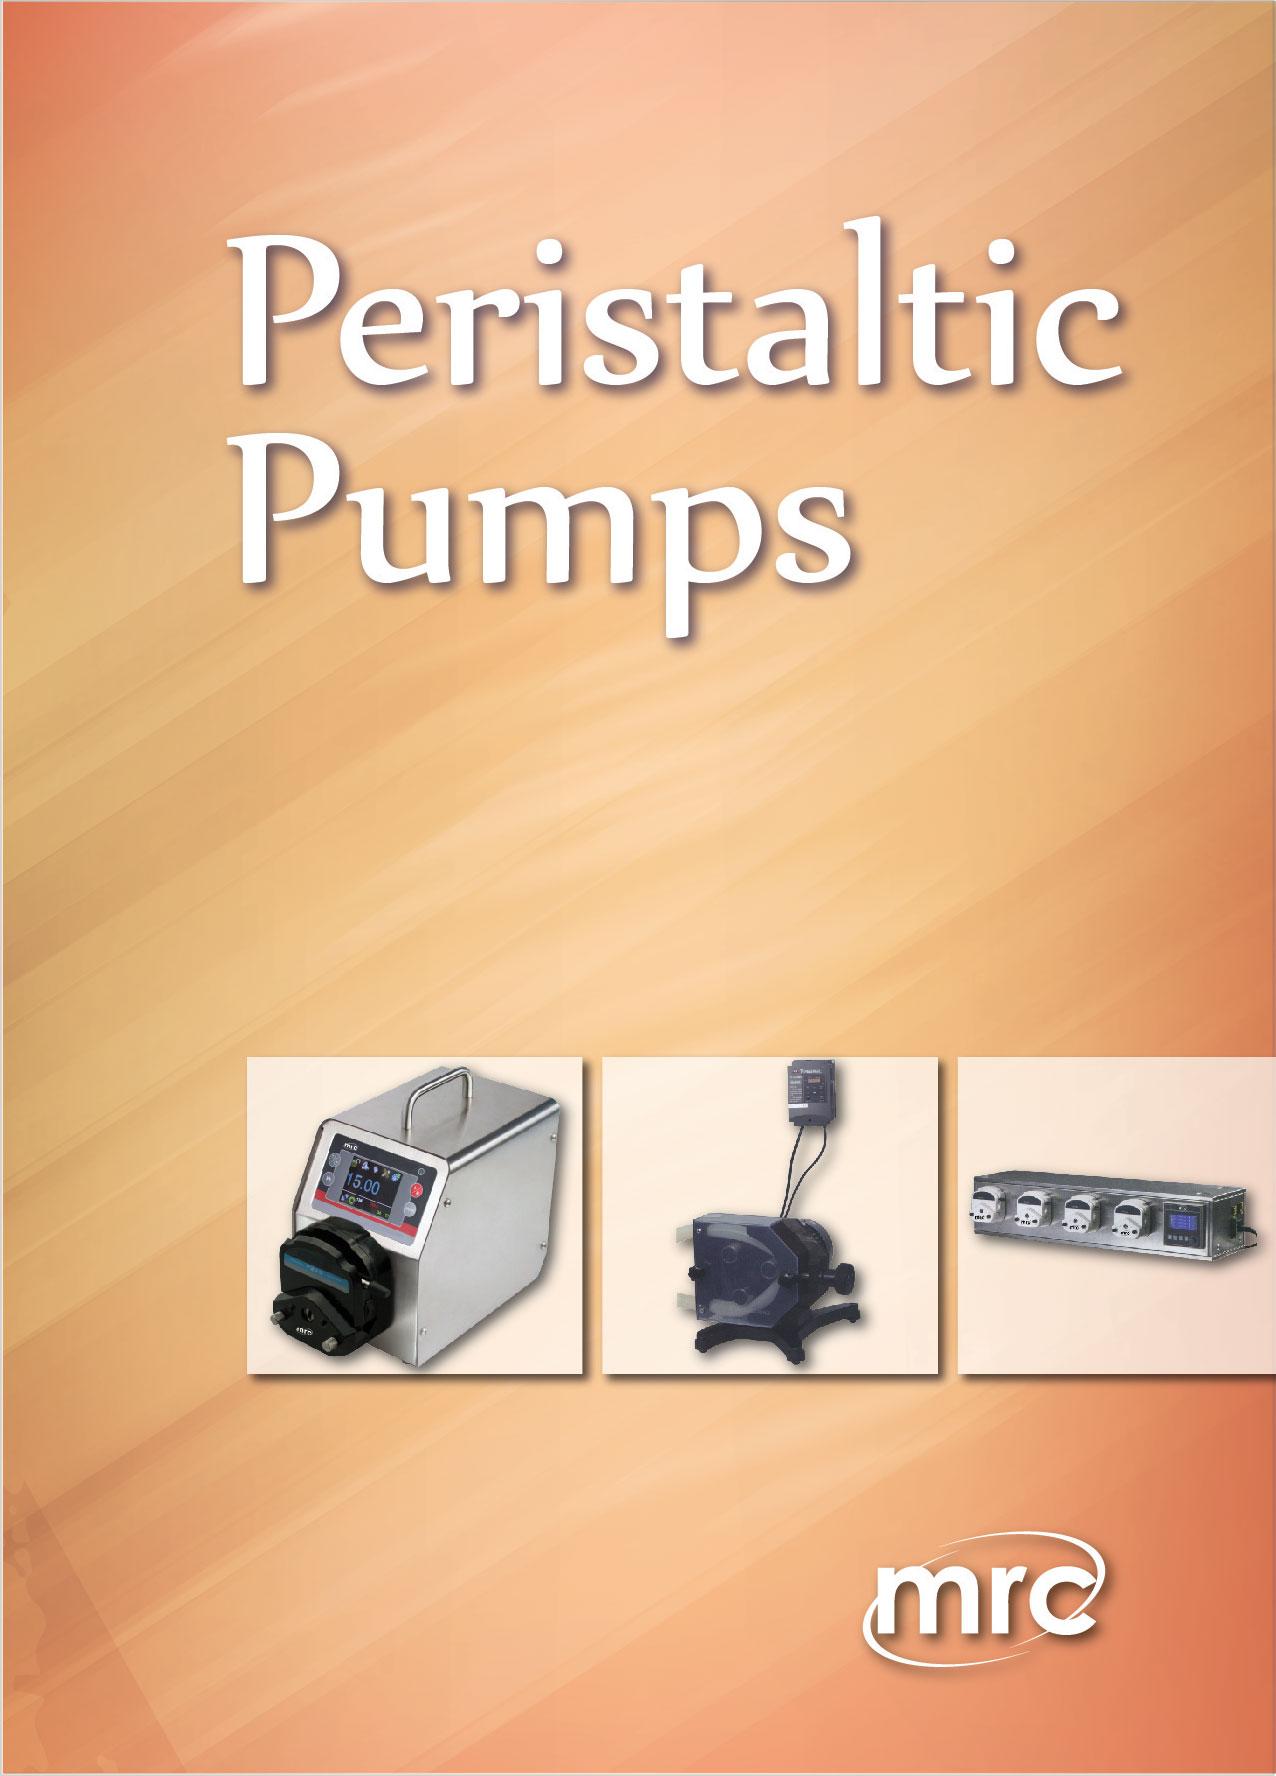 PeristalticPumps-COVER2017.jpg